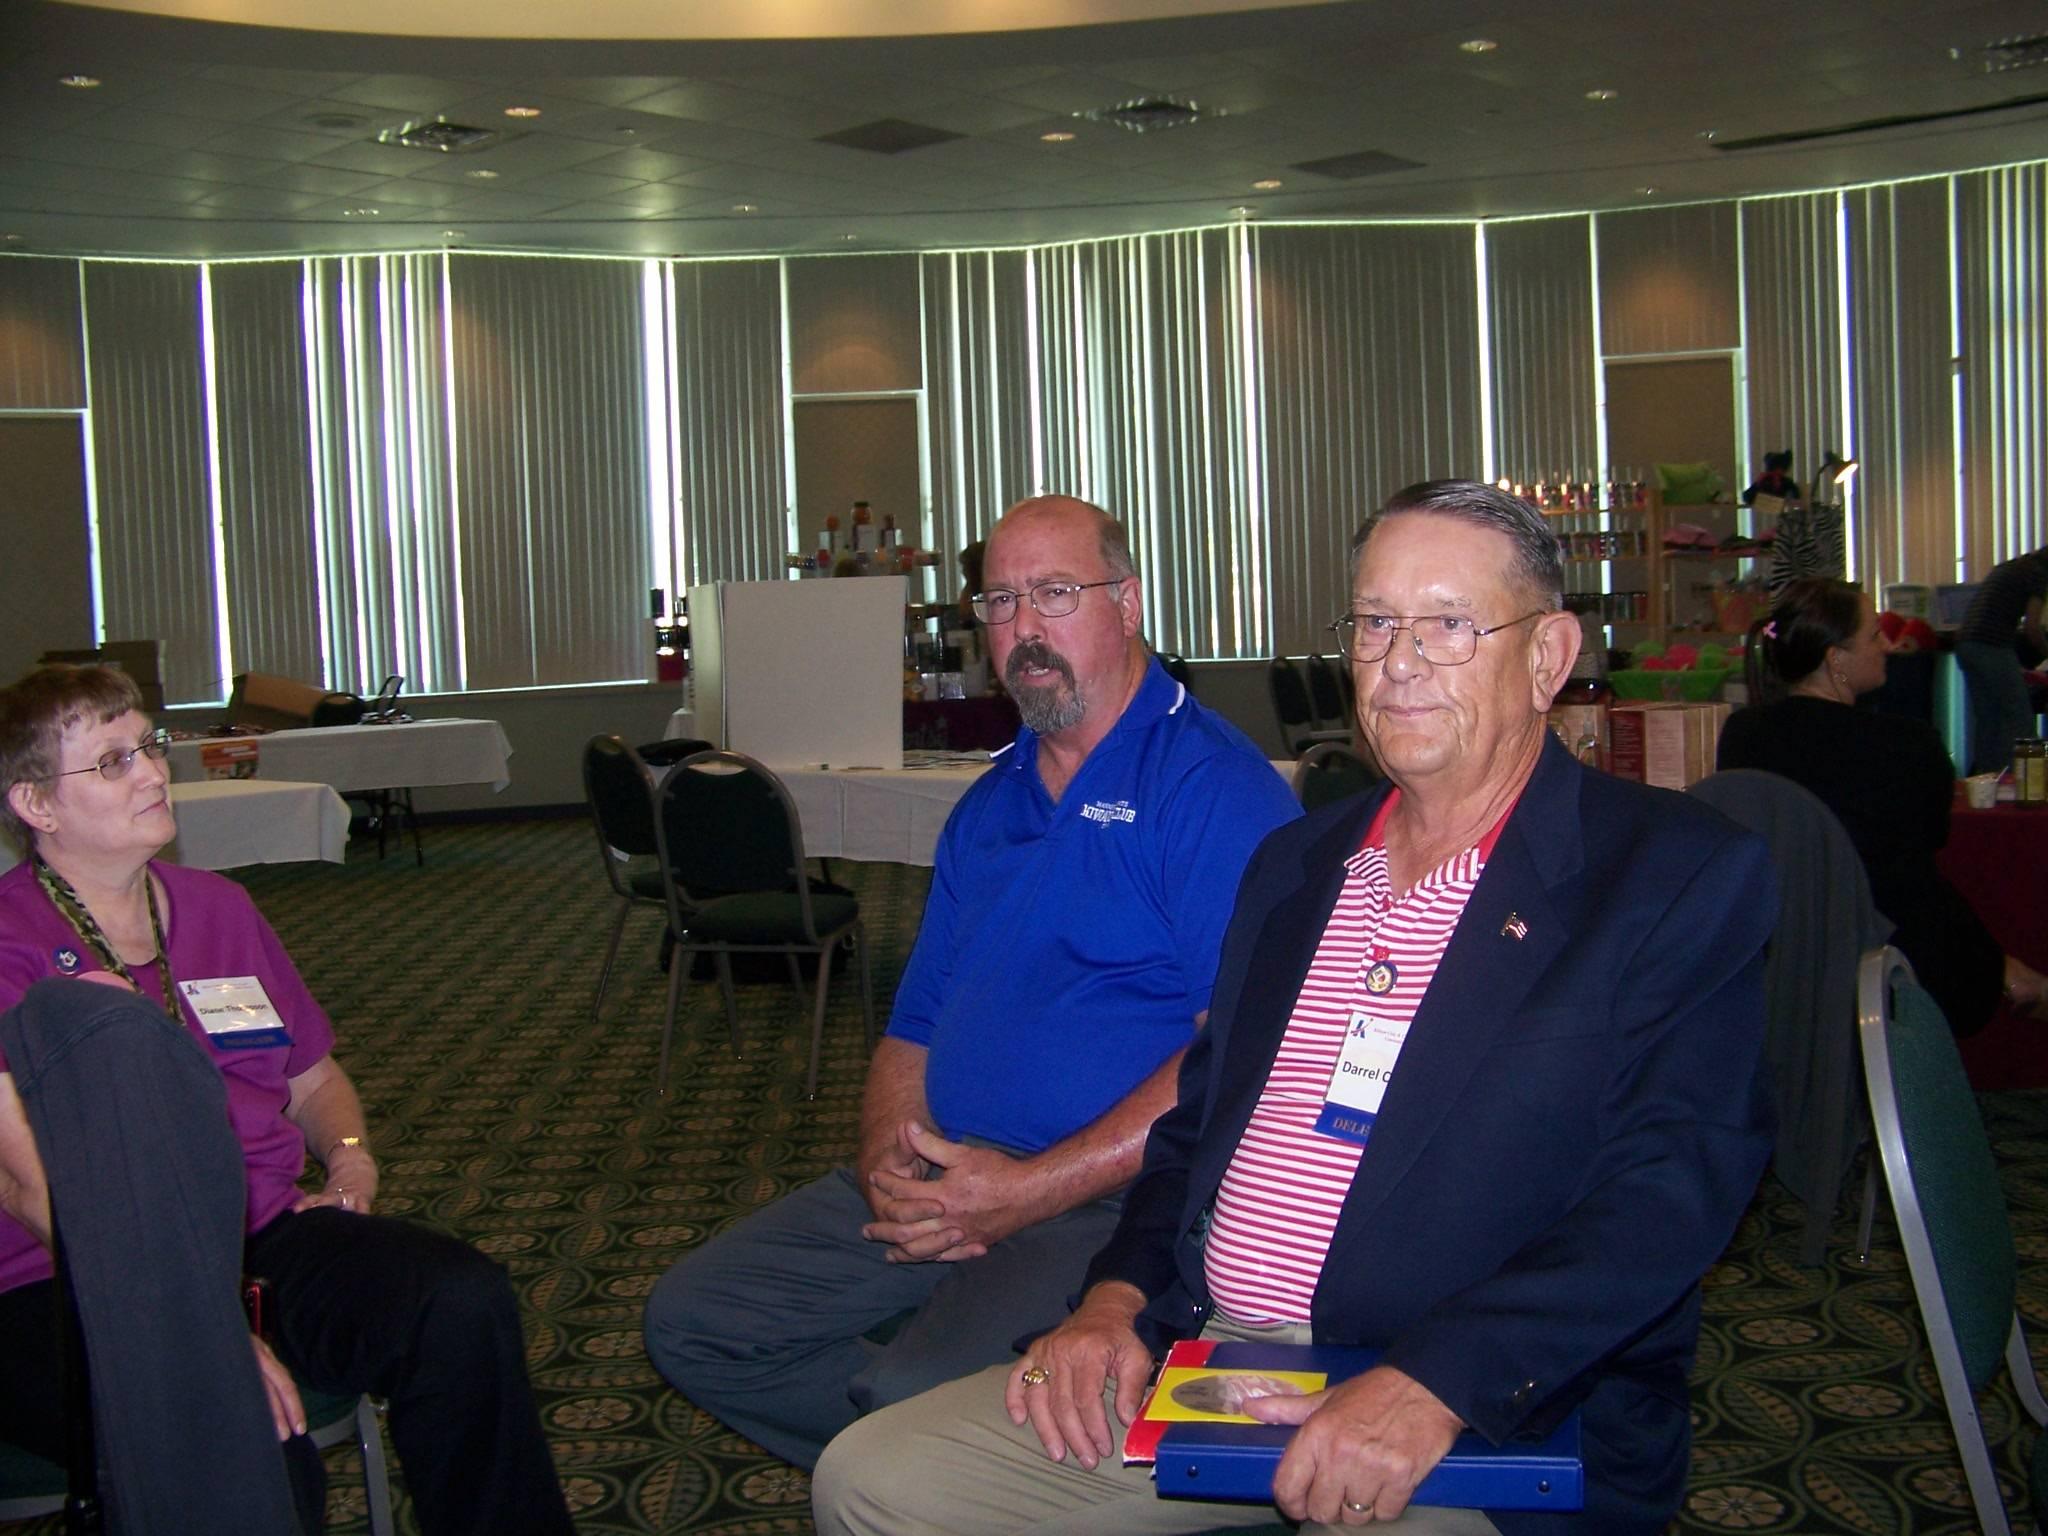 Diane Thompson, Paul Loughran, & Darrel Charlton